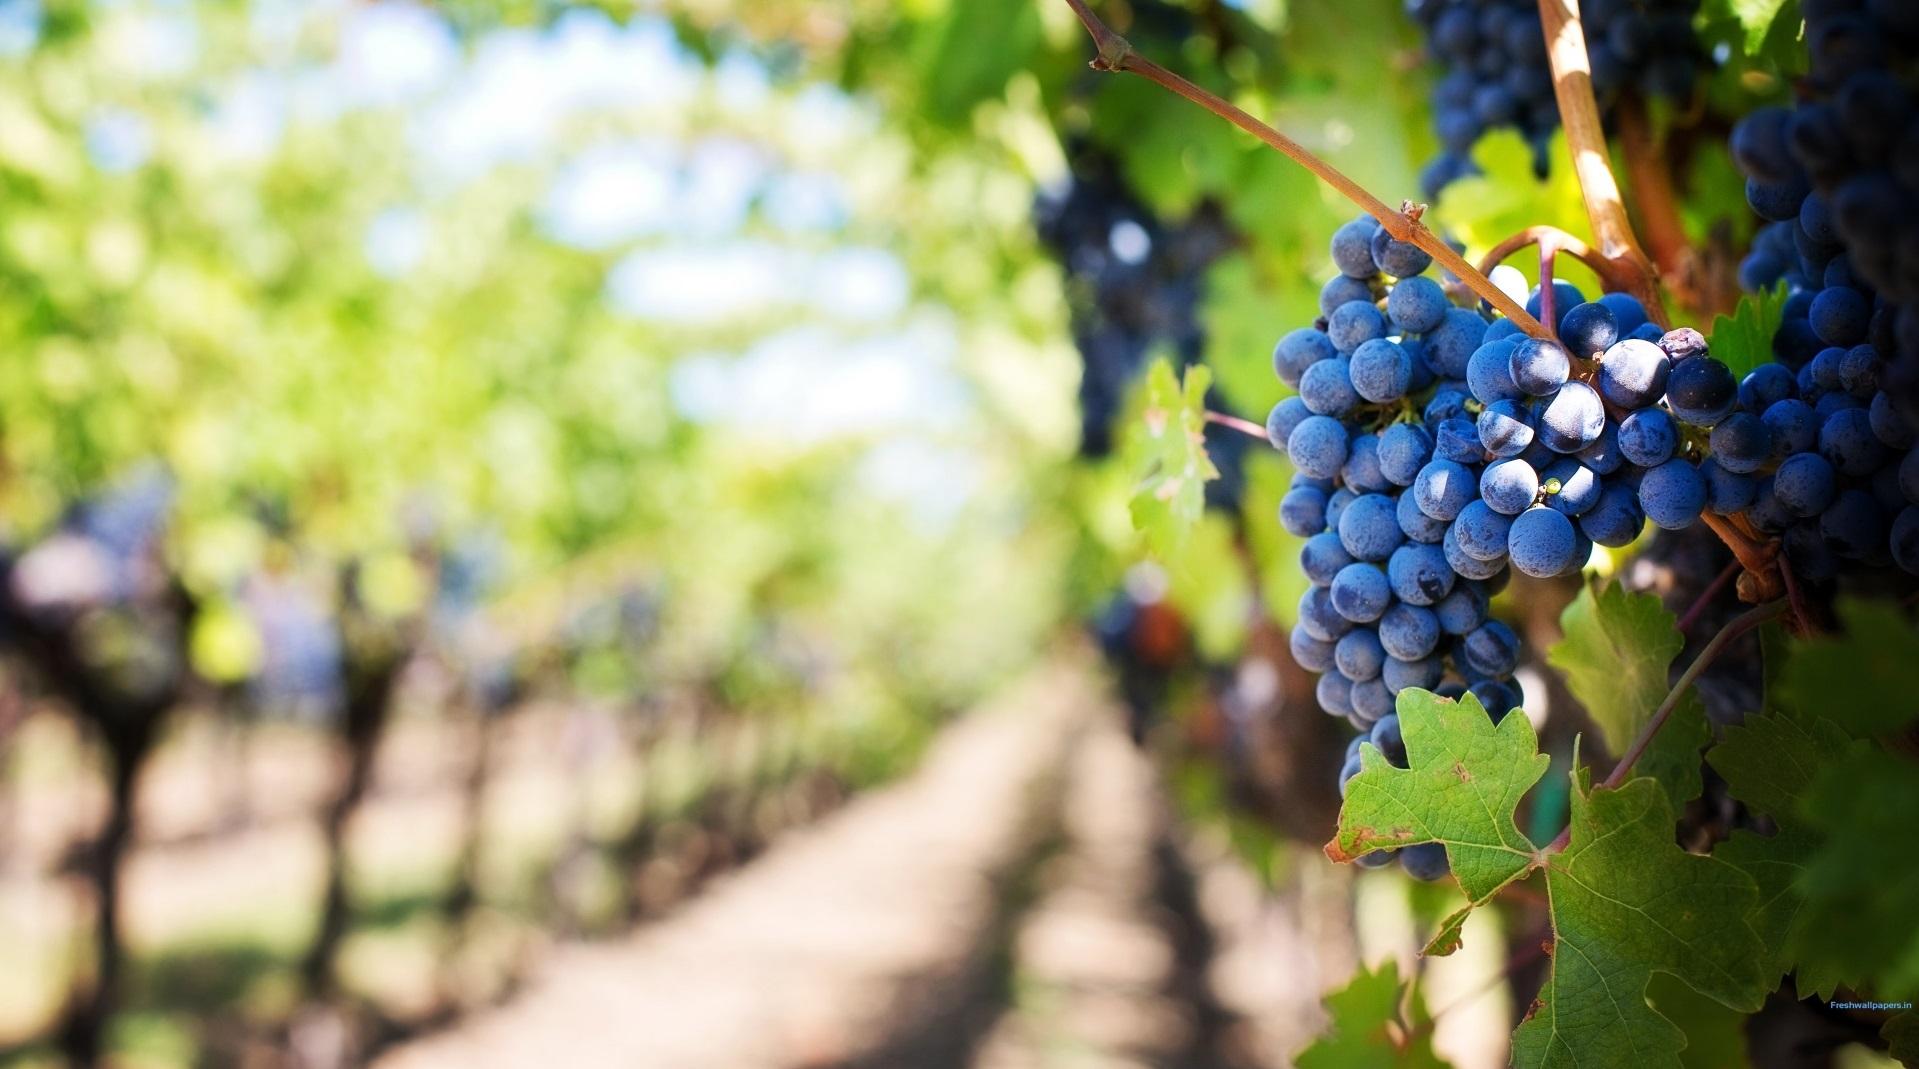 ripe_grapes_in_vineyard-1920x1200